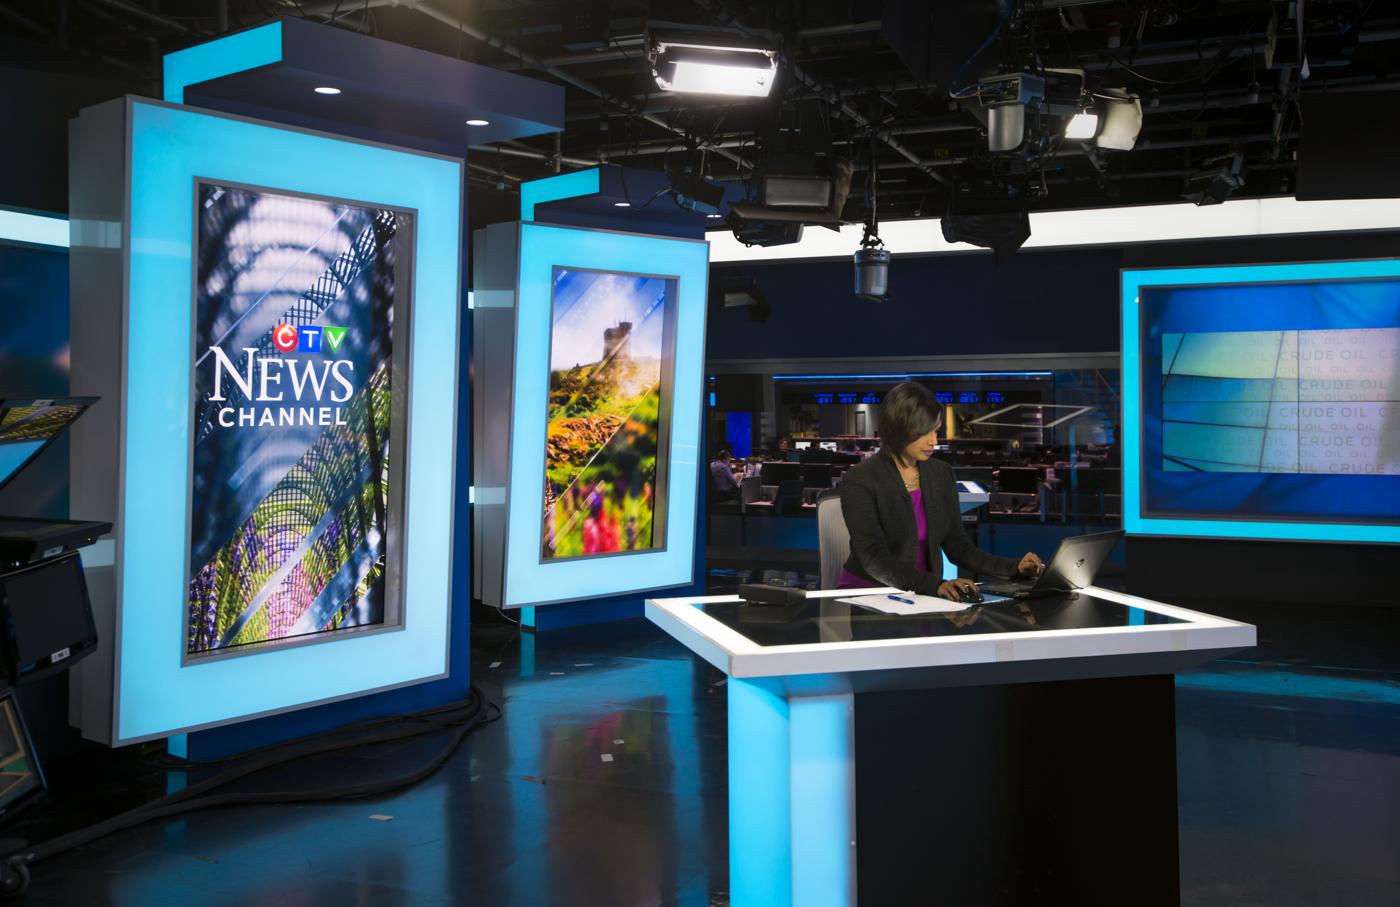 ncs_ctv-news-network-studio-toronto_0003